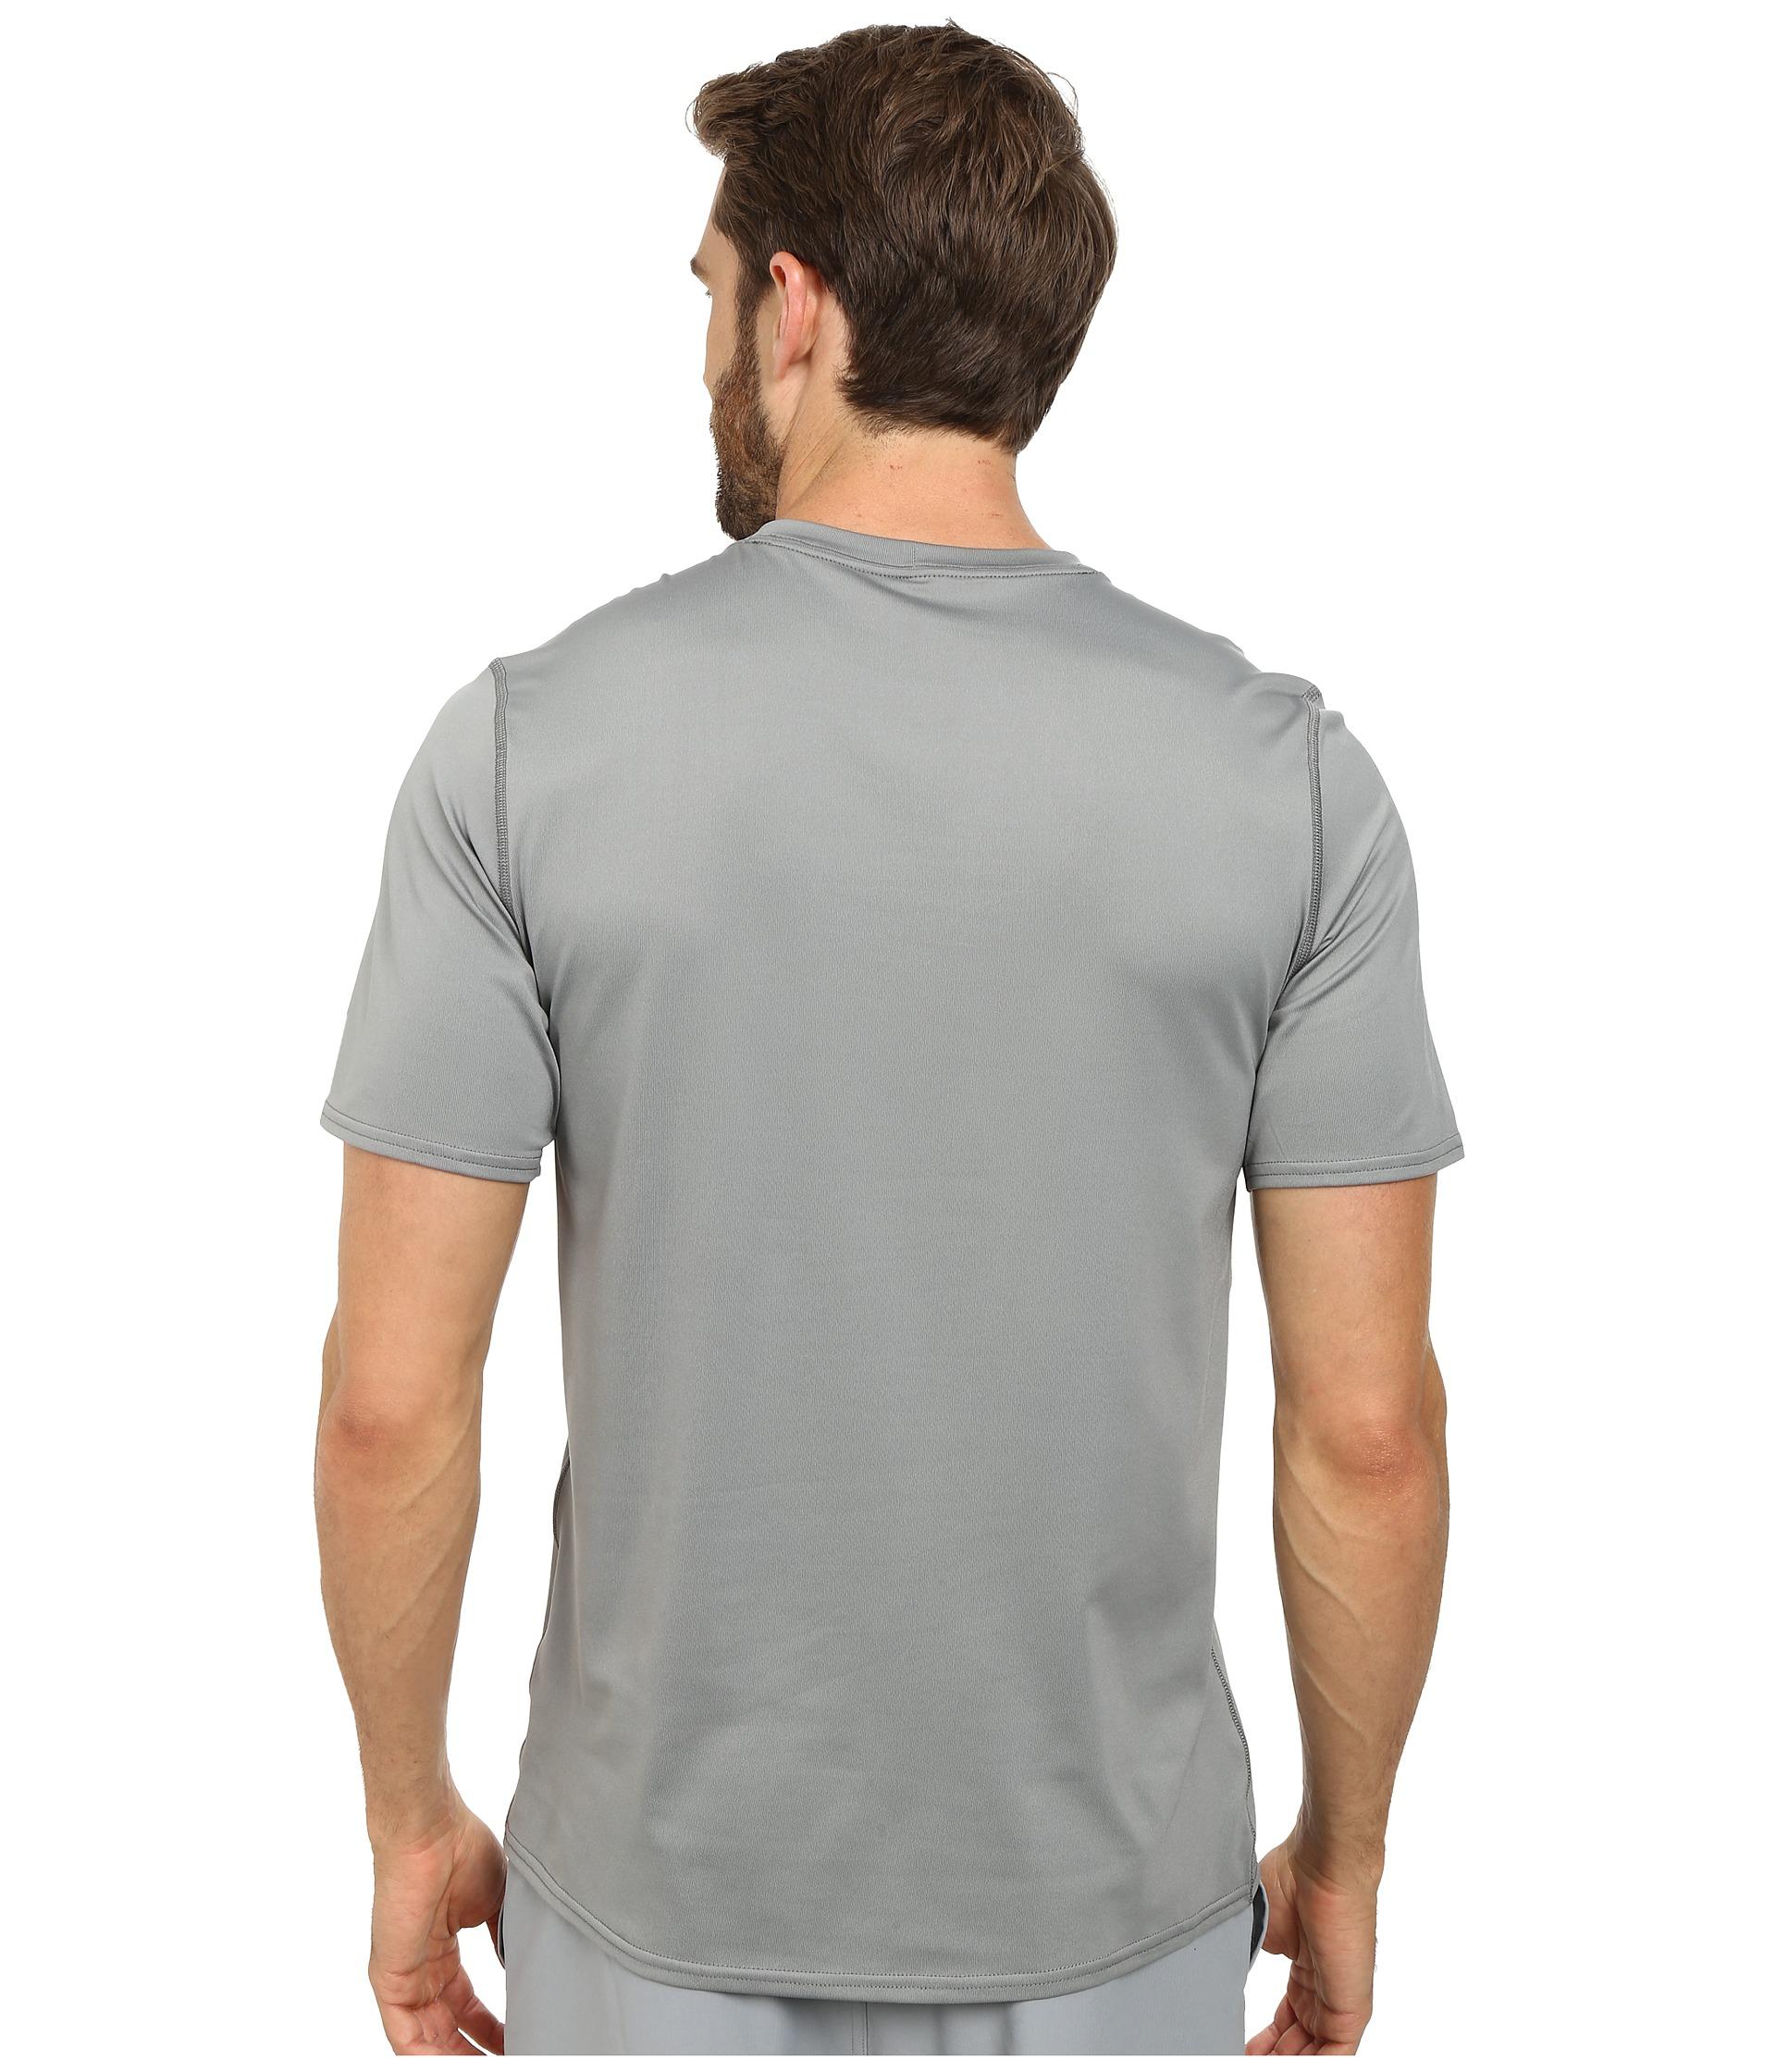 Patagonia R Sun Tee In Gray For Men Lyst